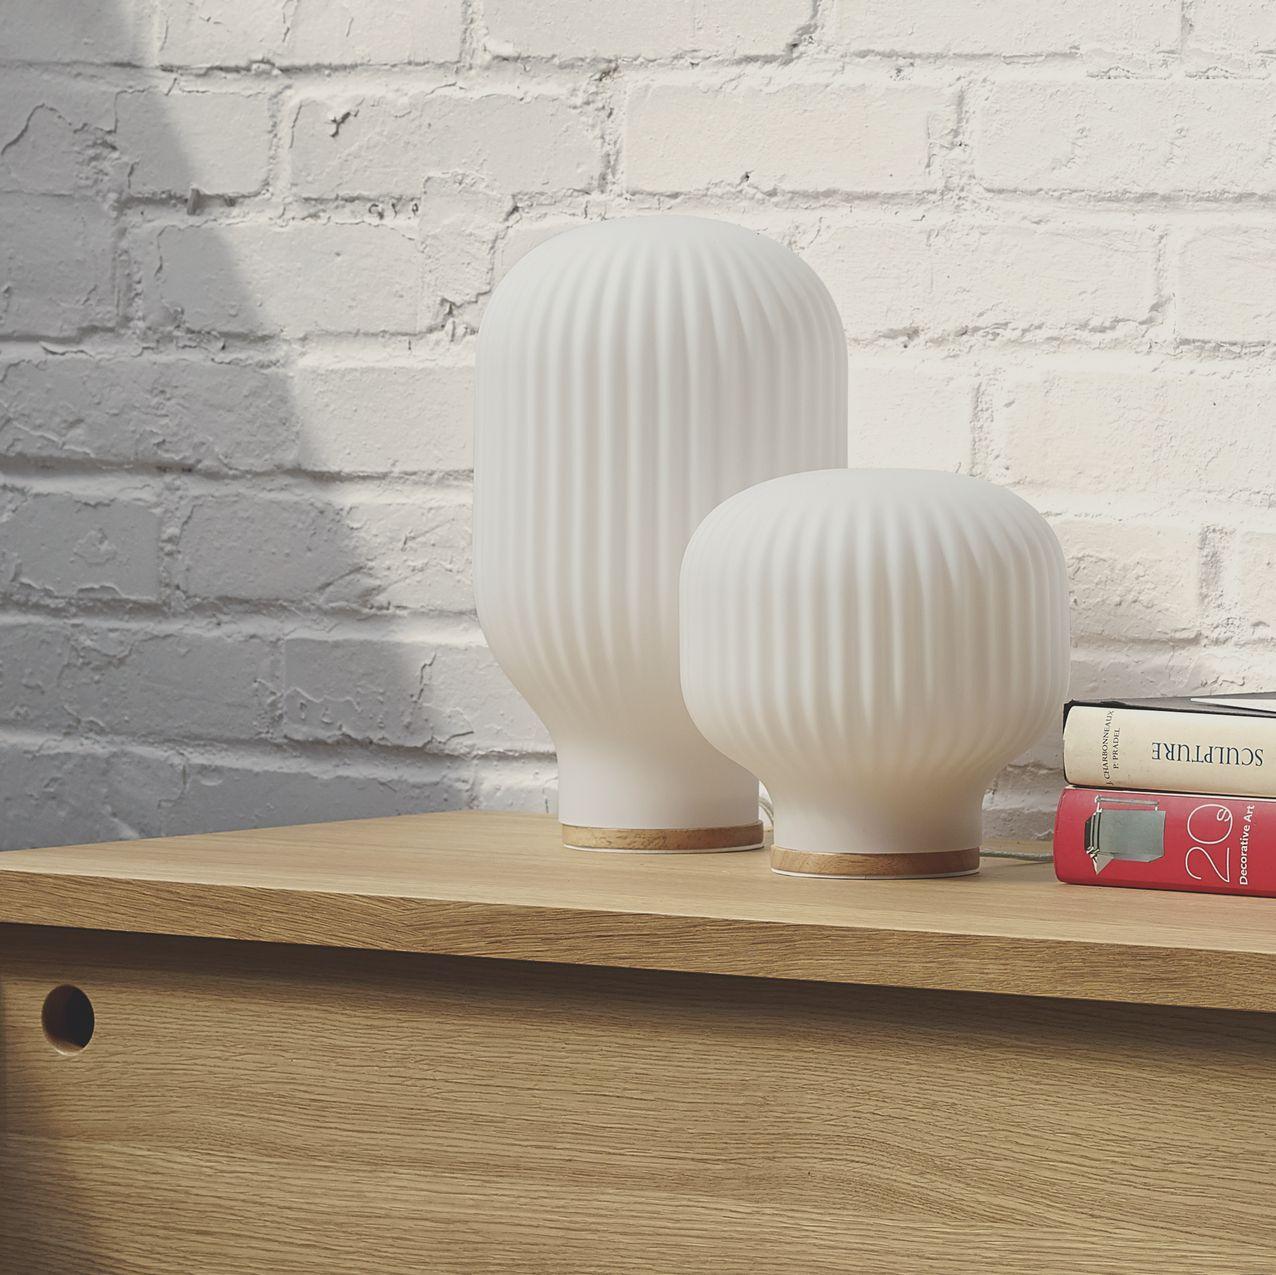 Baja Lampe De Table 19cm En Verre Blanc Lampes De Table Lampe De Table Blanche Mobilier De Salon